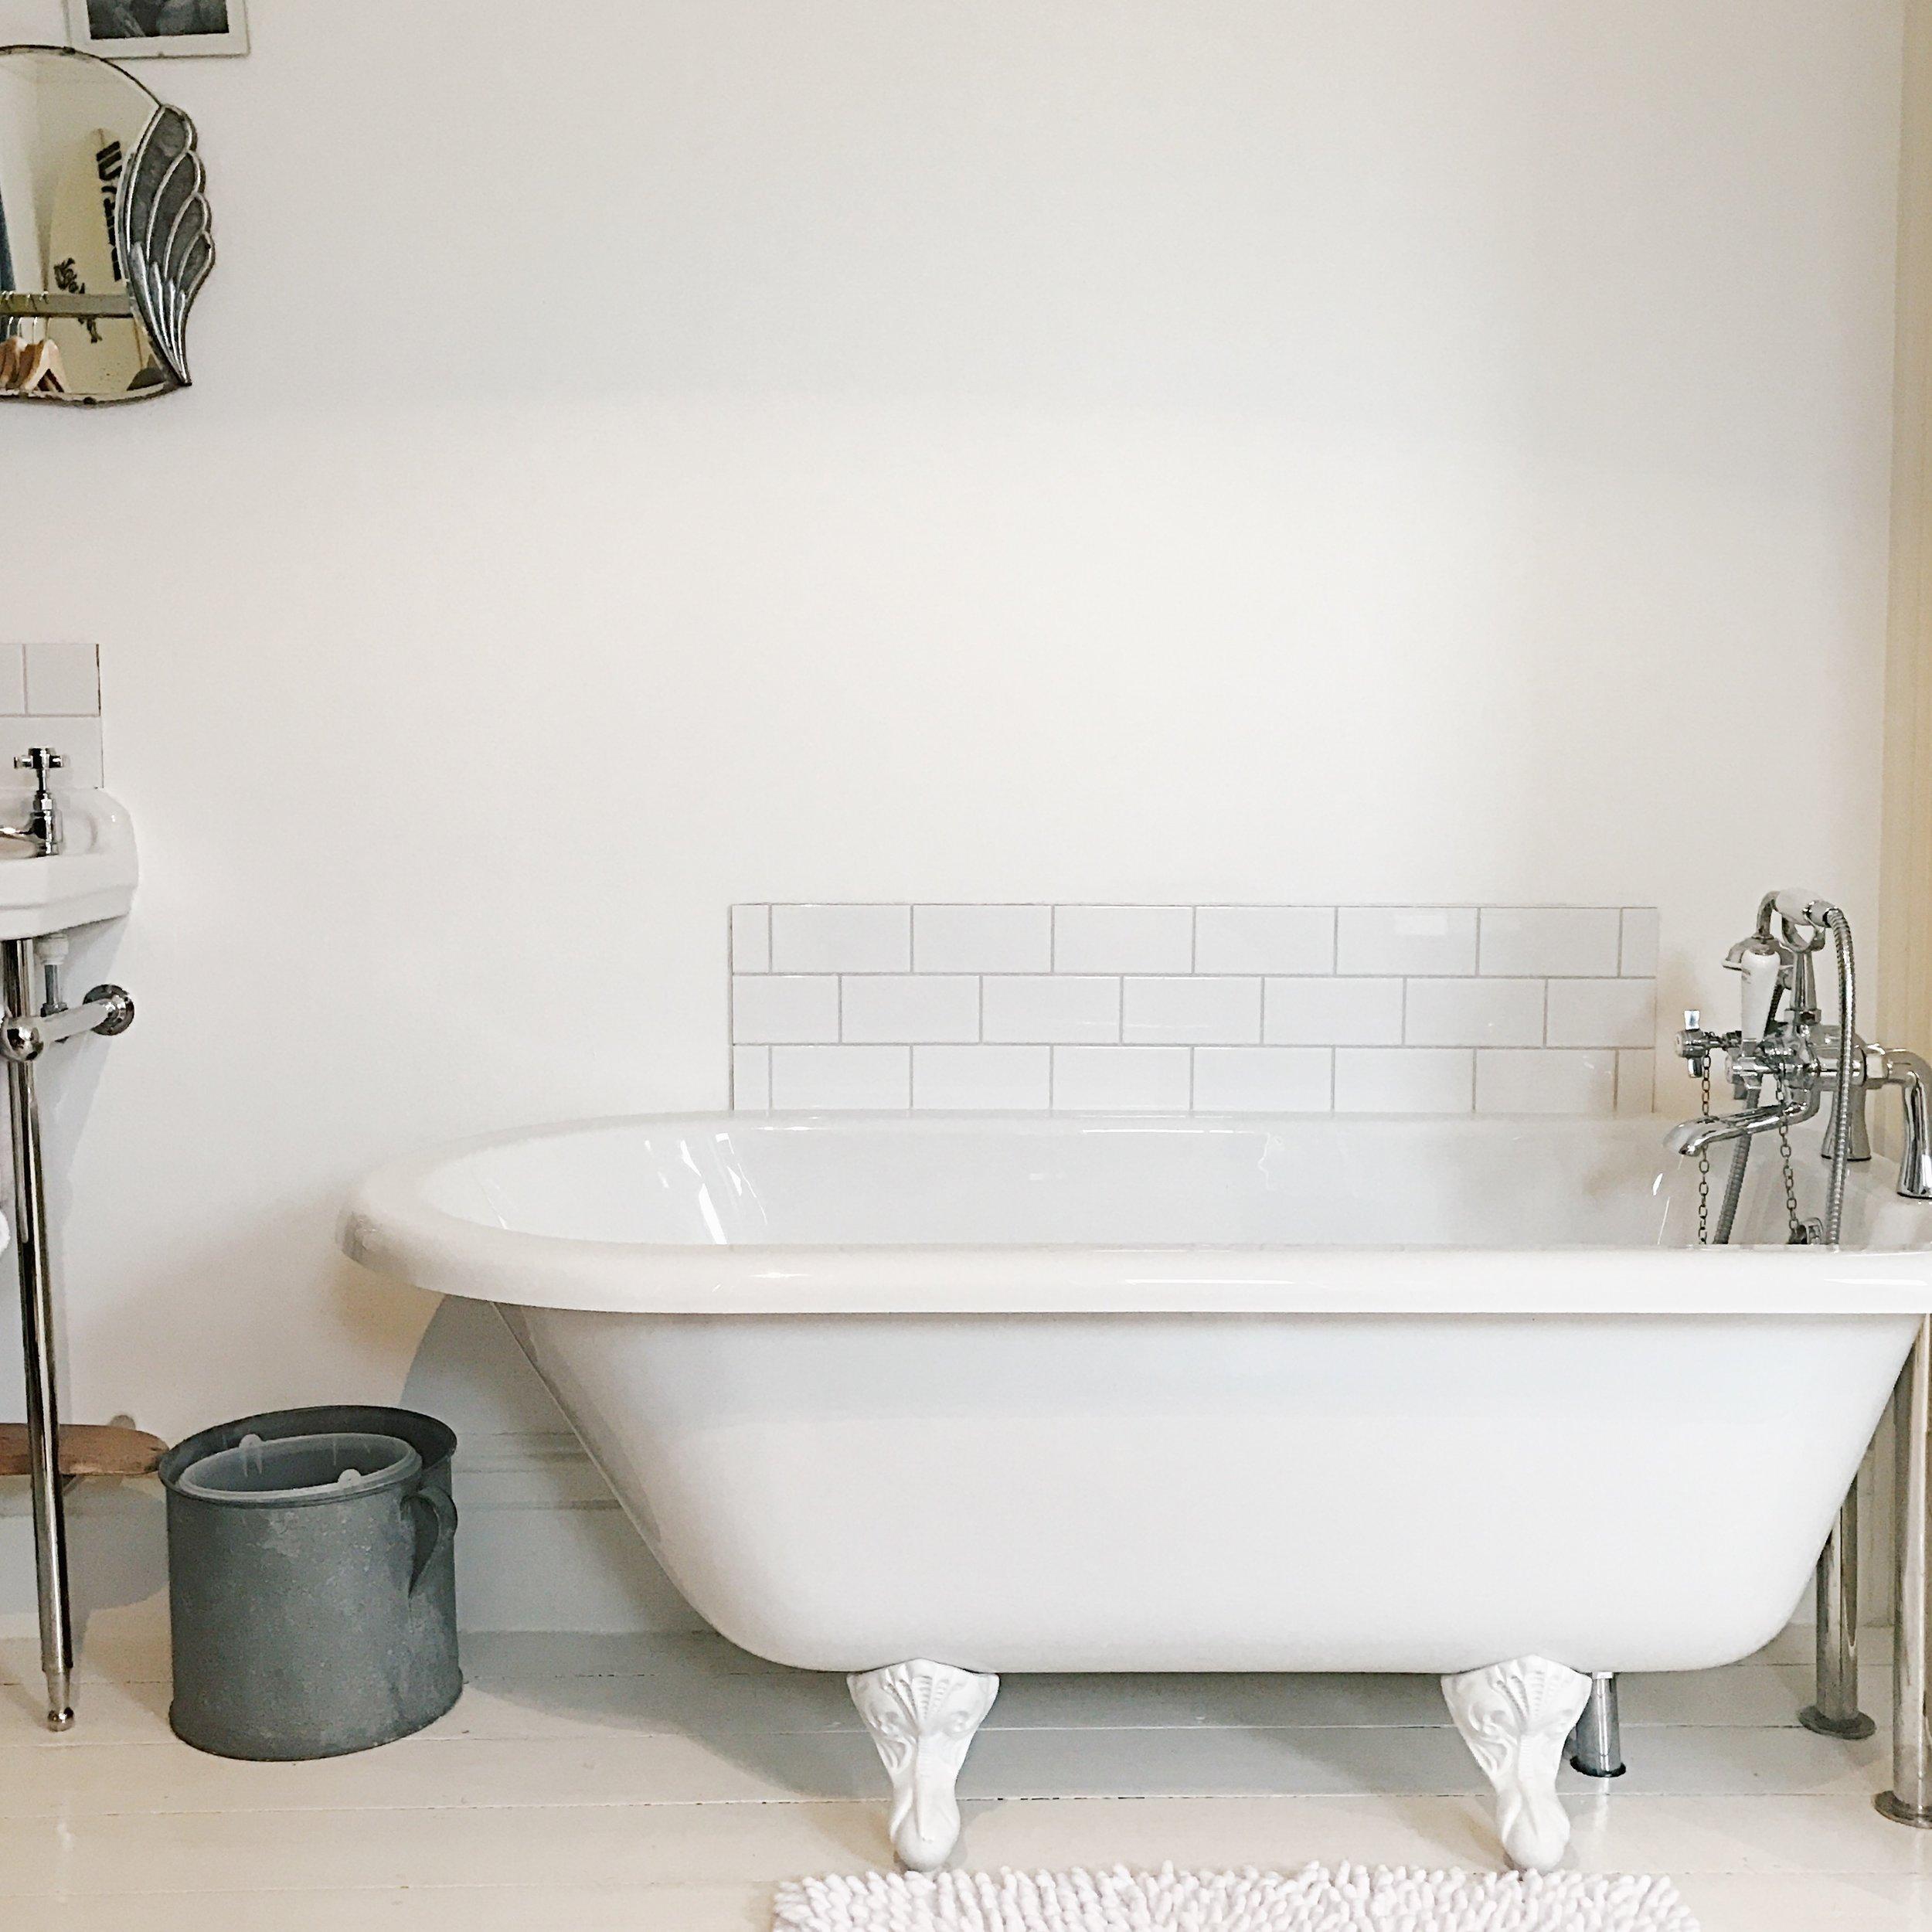 Holland-Road-Bathroom.JPG